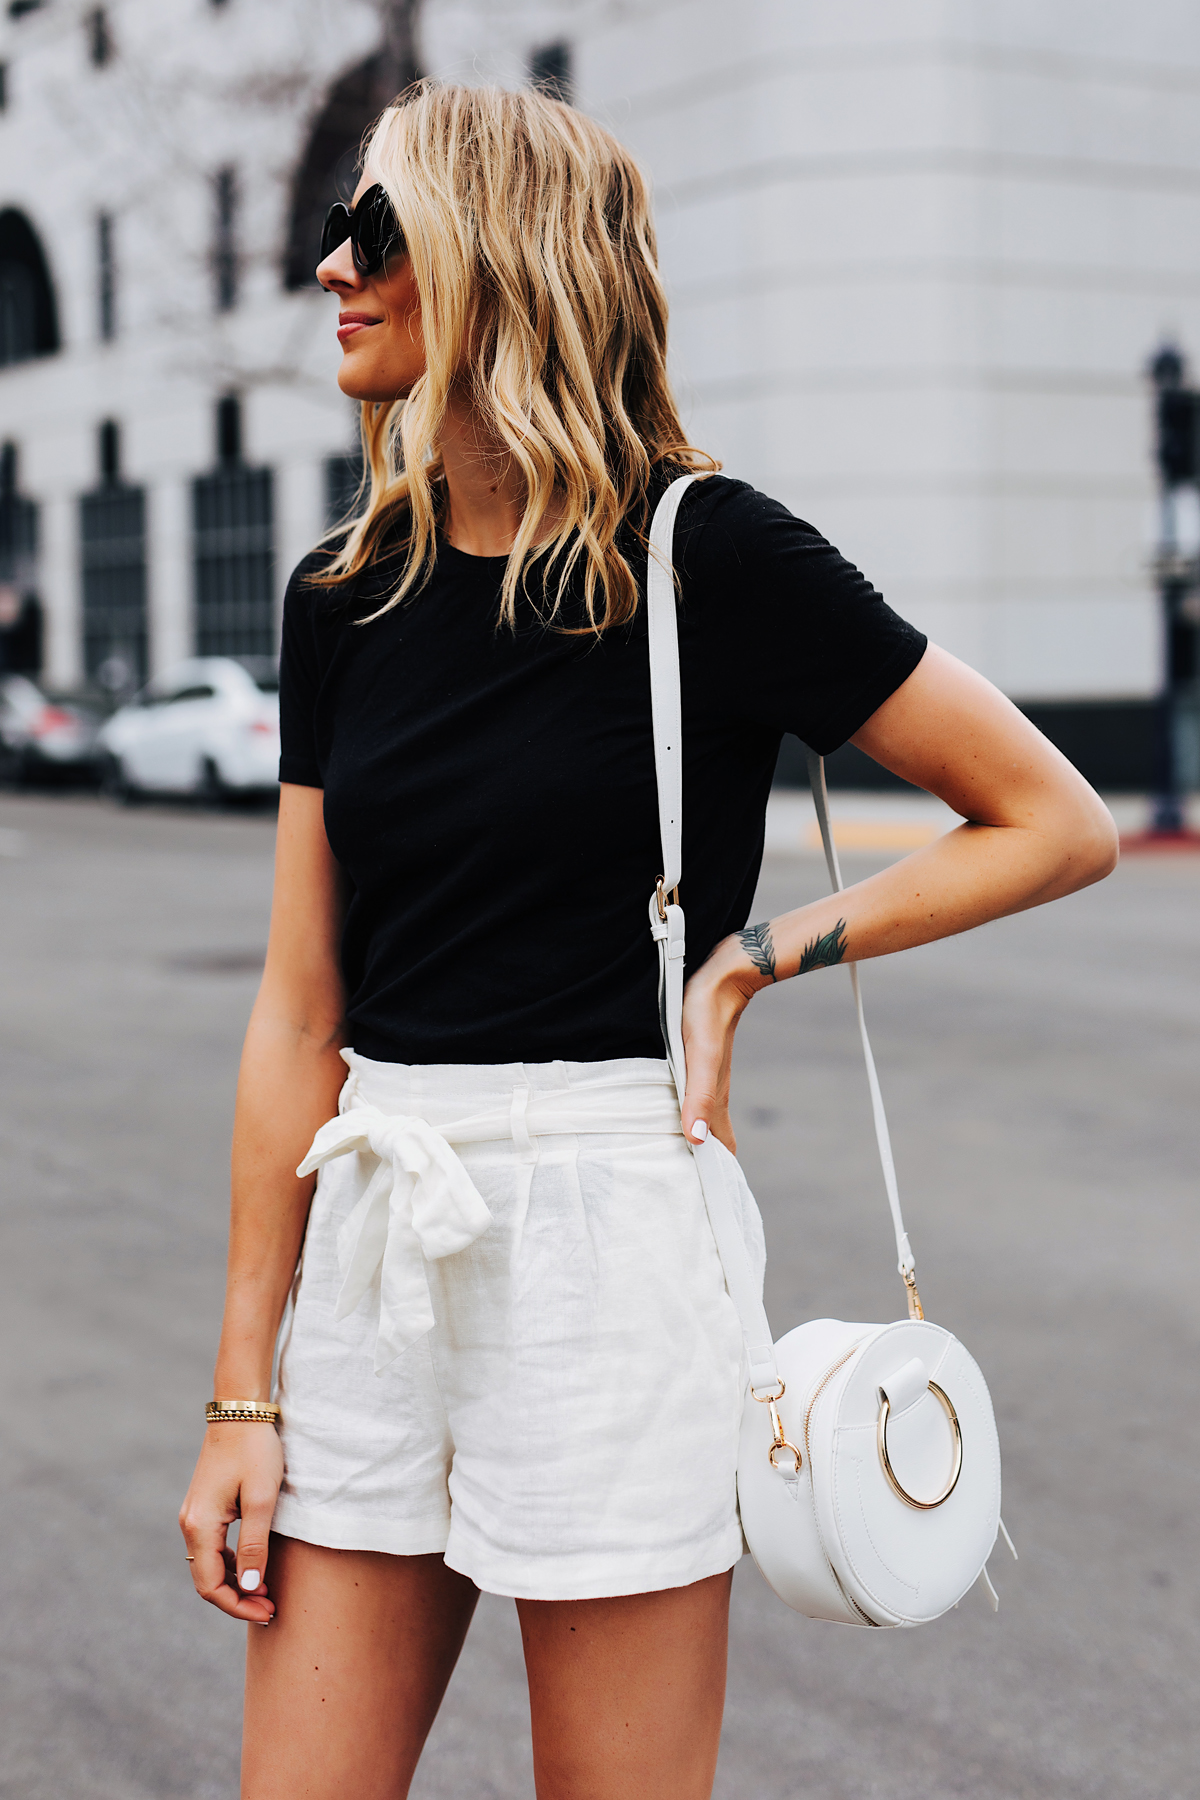 Fashion Jackson Wearing Black Tshirt White Tie Front Shorts White Circle Handbag 1